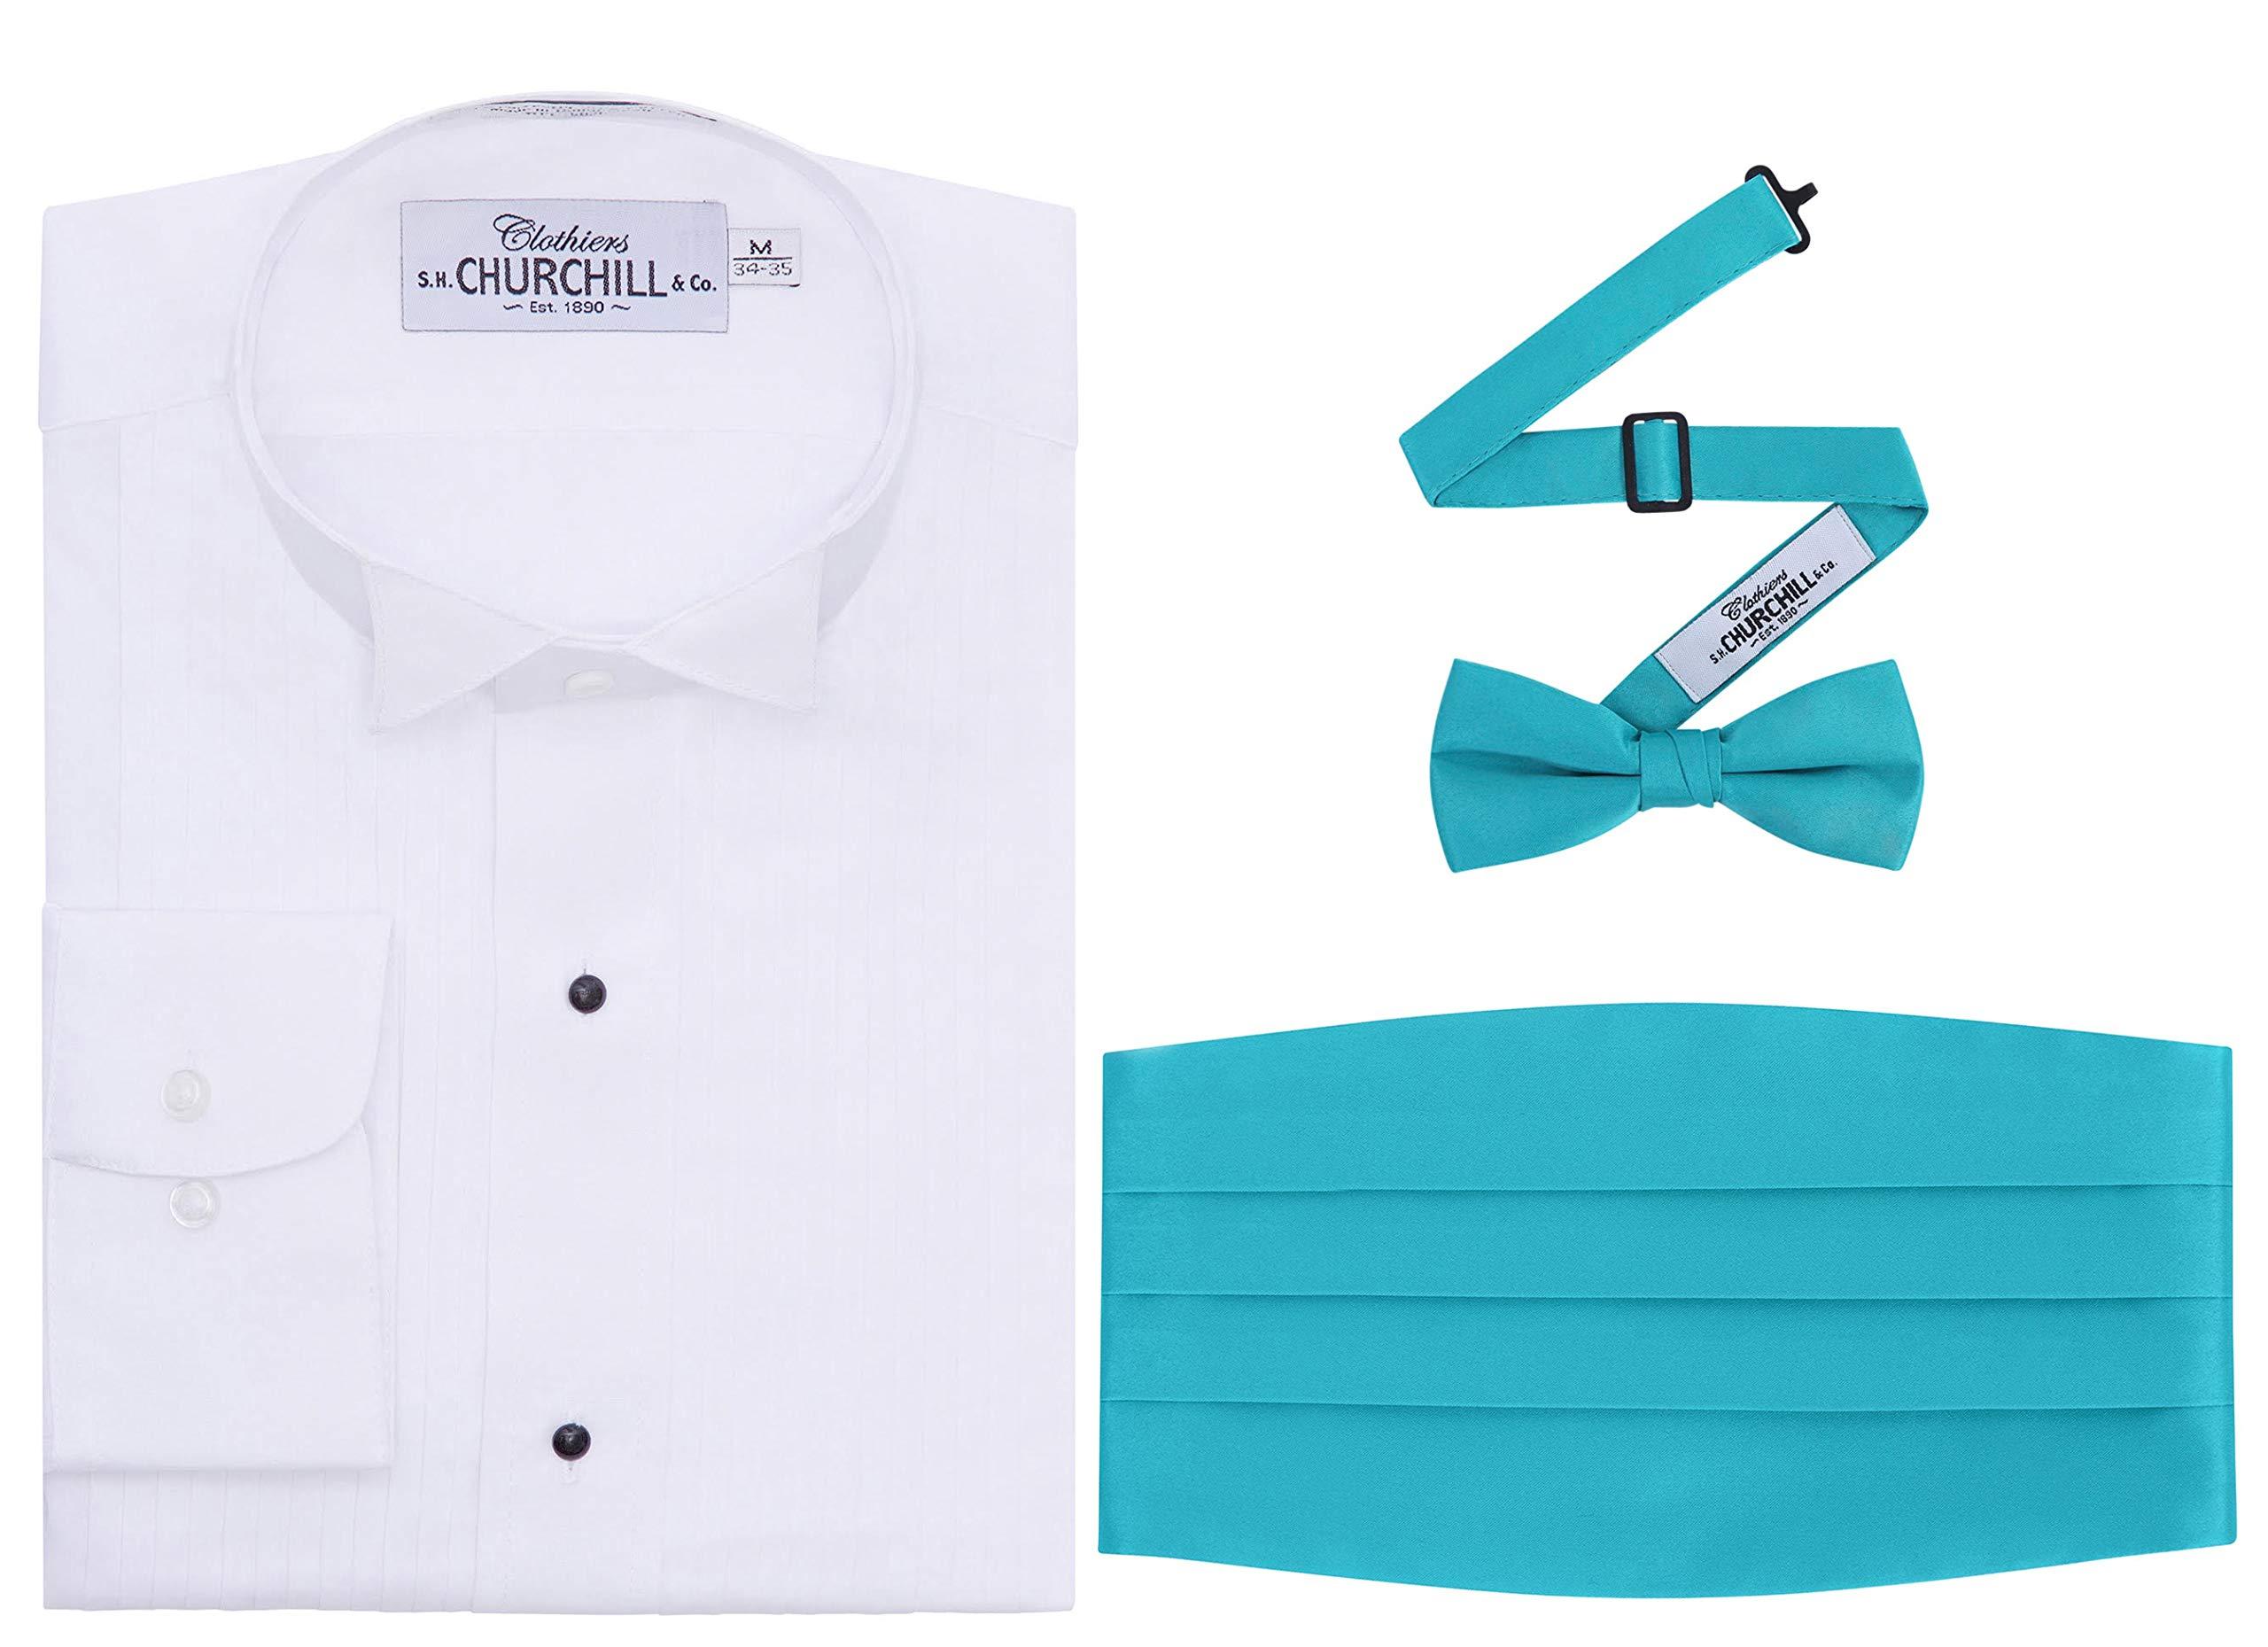 White Pleated Wing Tuxedo Shirt-L(16 Nk,35 SLV) Teal Cummerbund Bowtie by S.H. Churchill & Co.